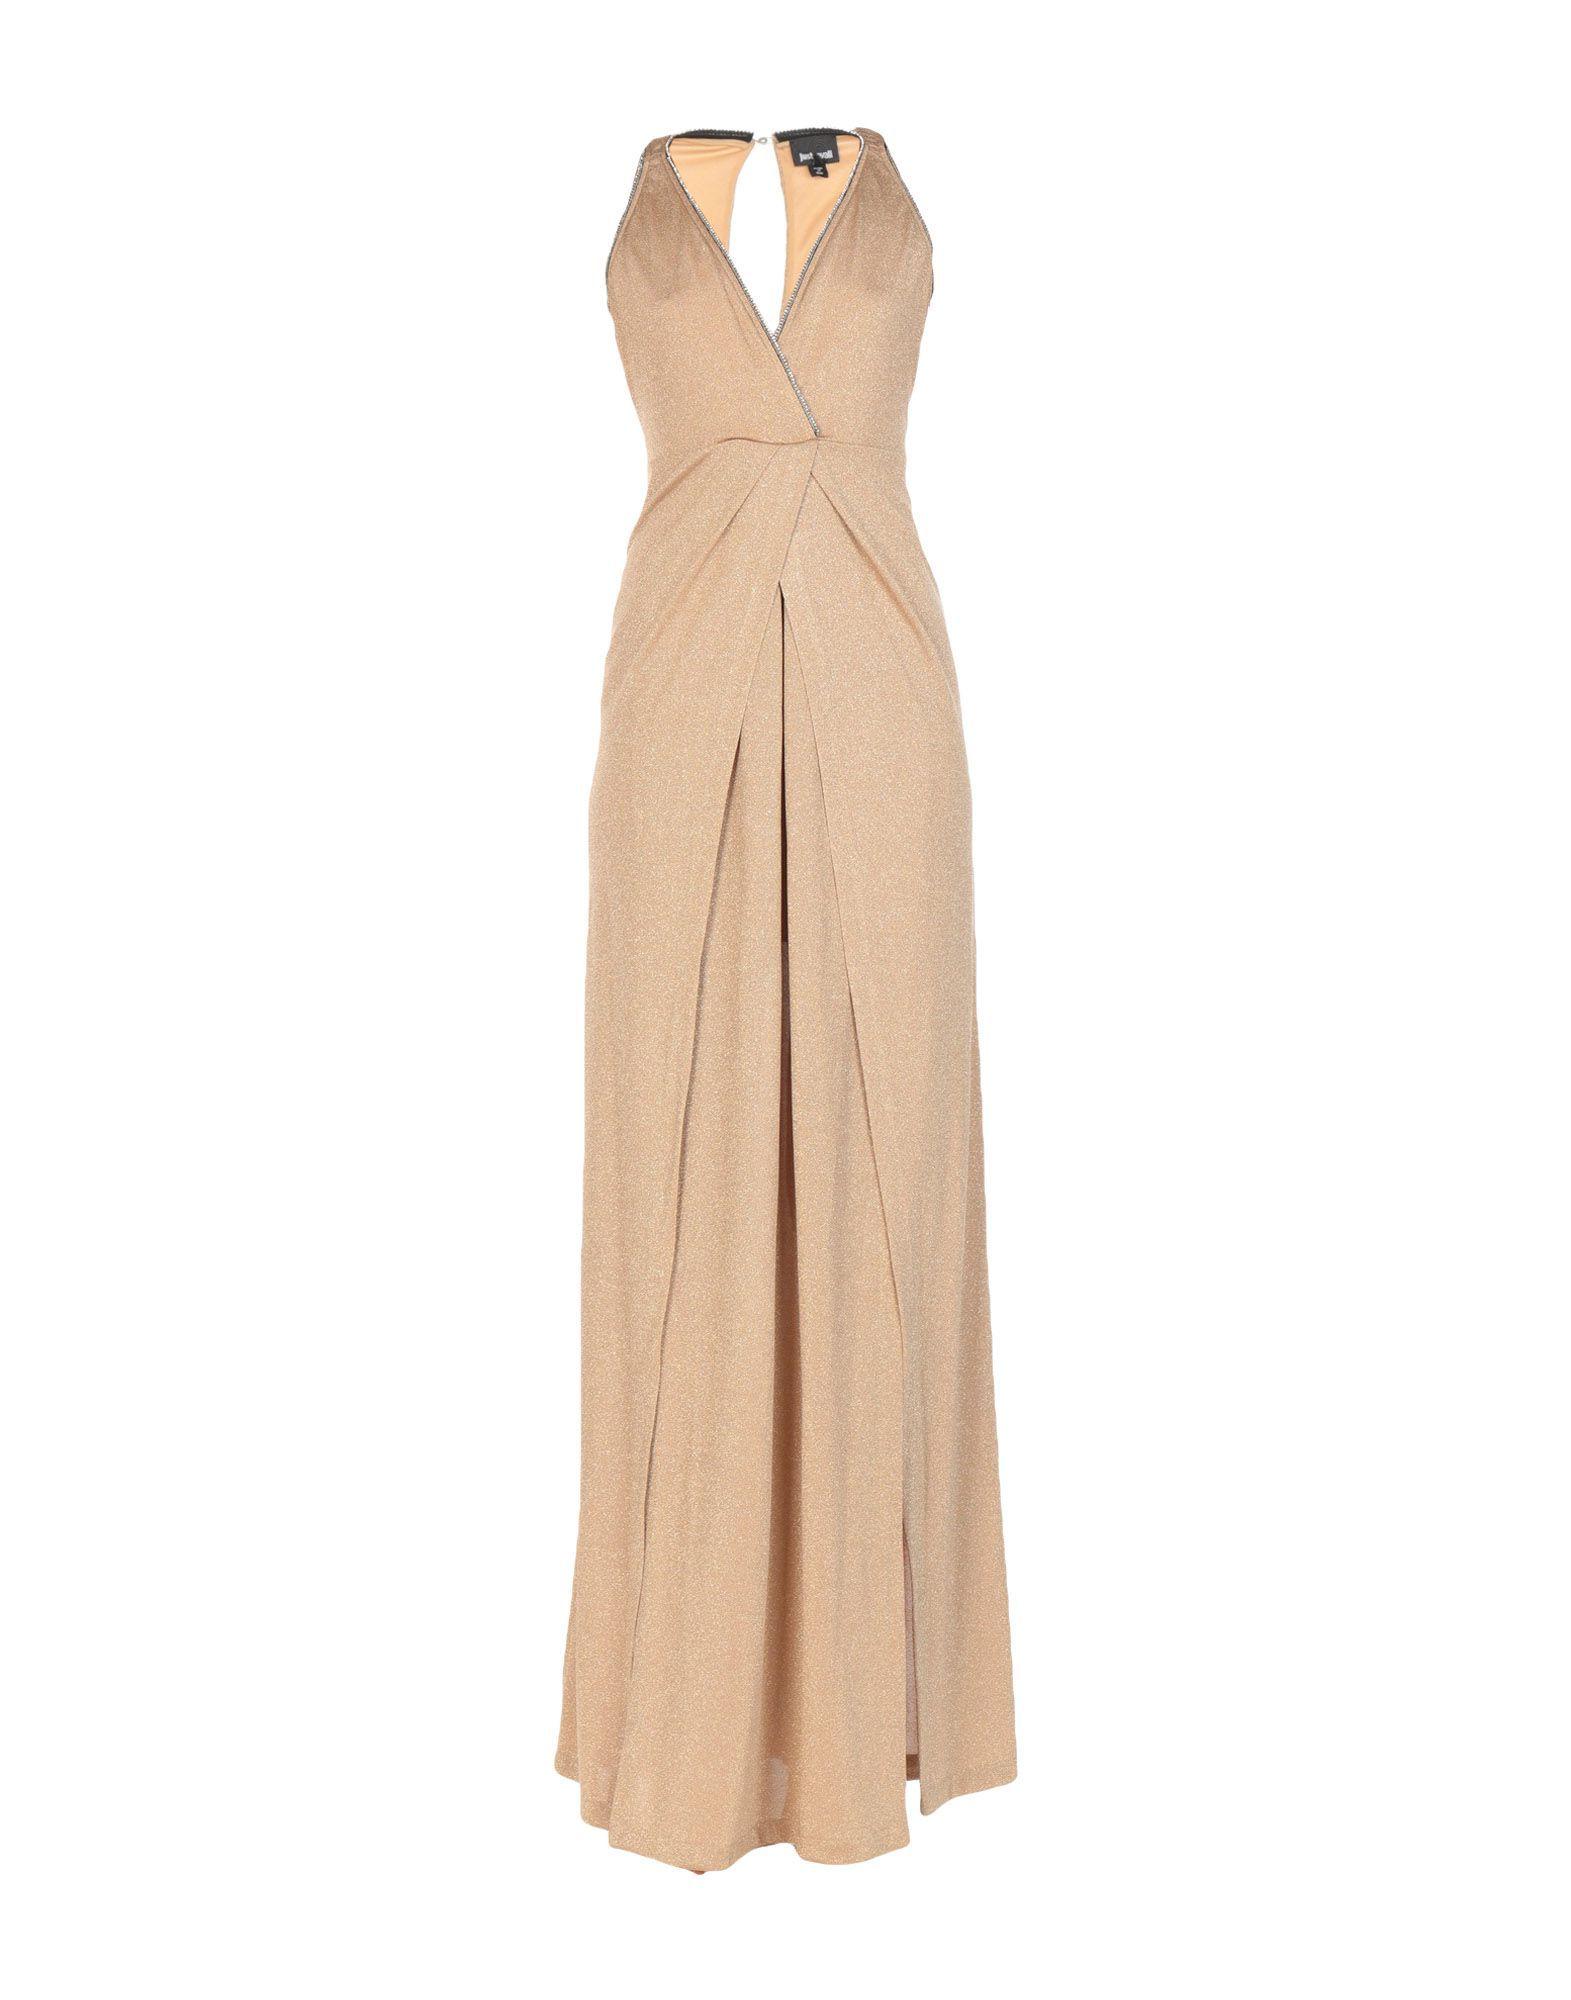 Just Cavalli Camel Full Length Dress